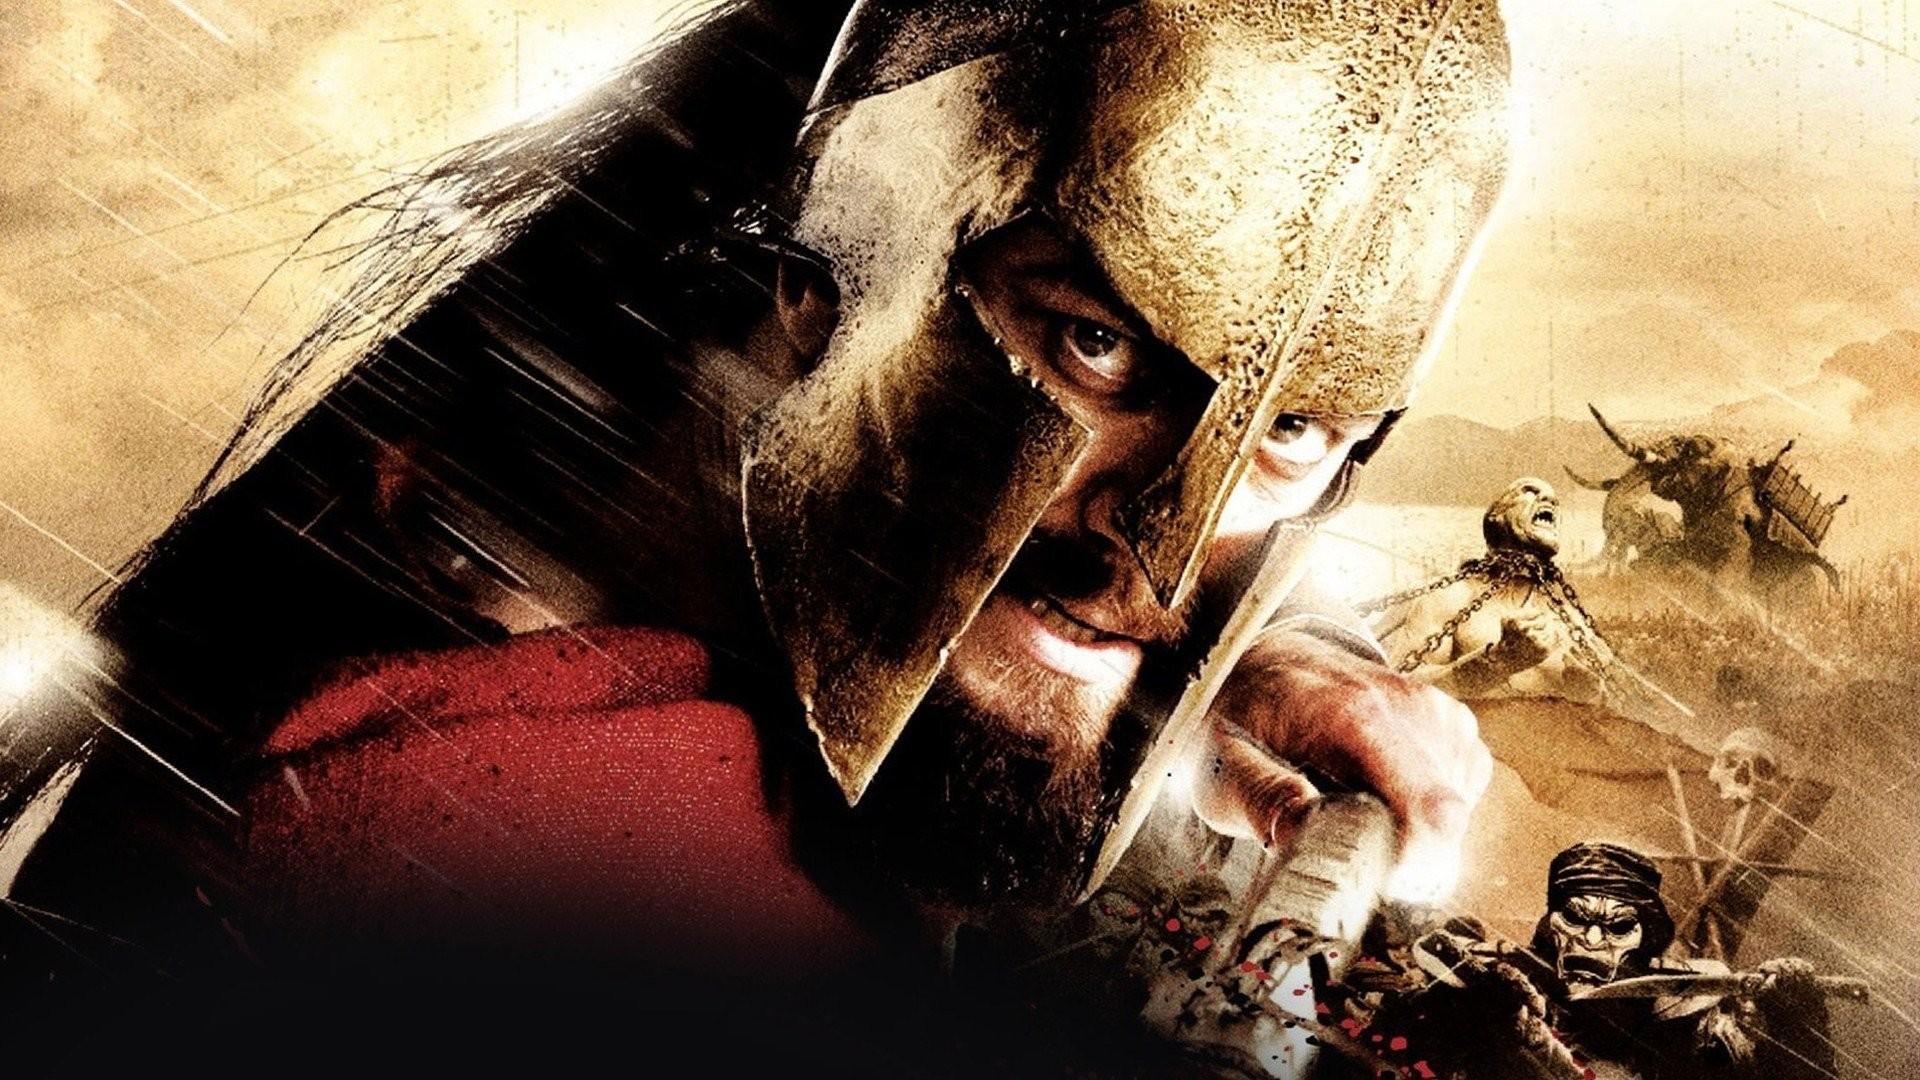 300 Spartans Wallpaper 57 Images